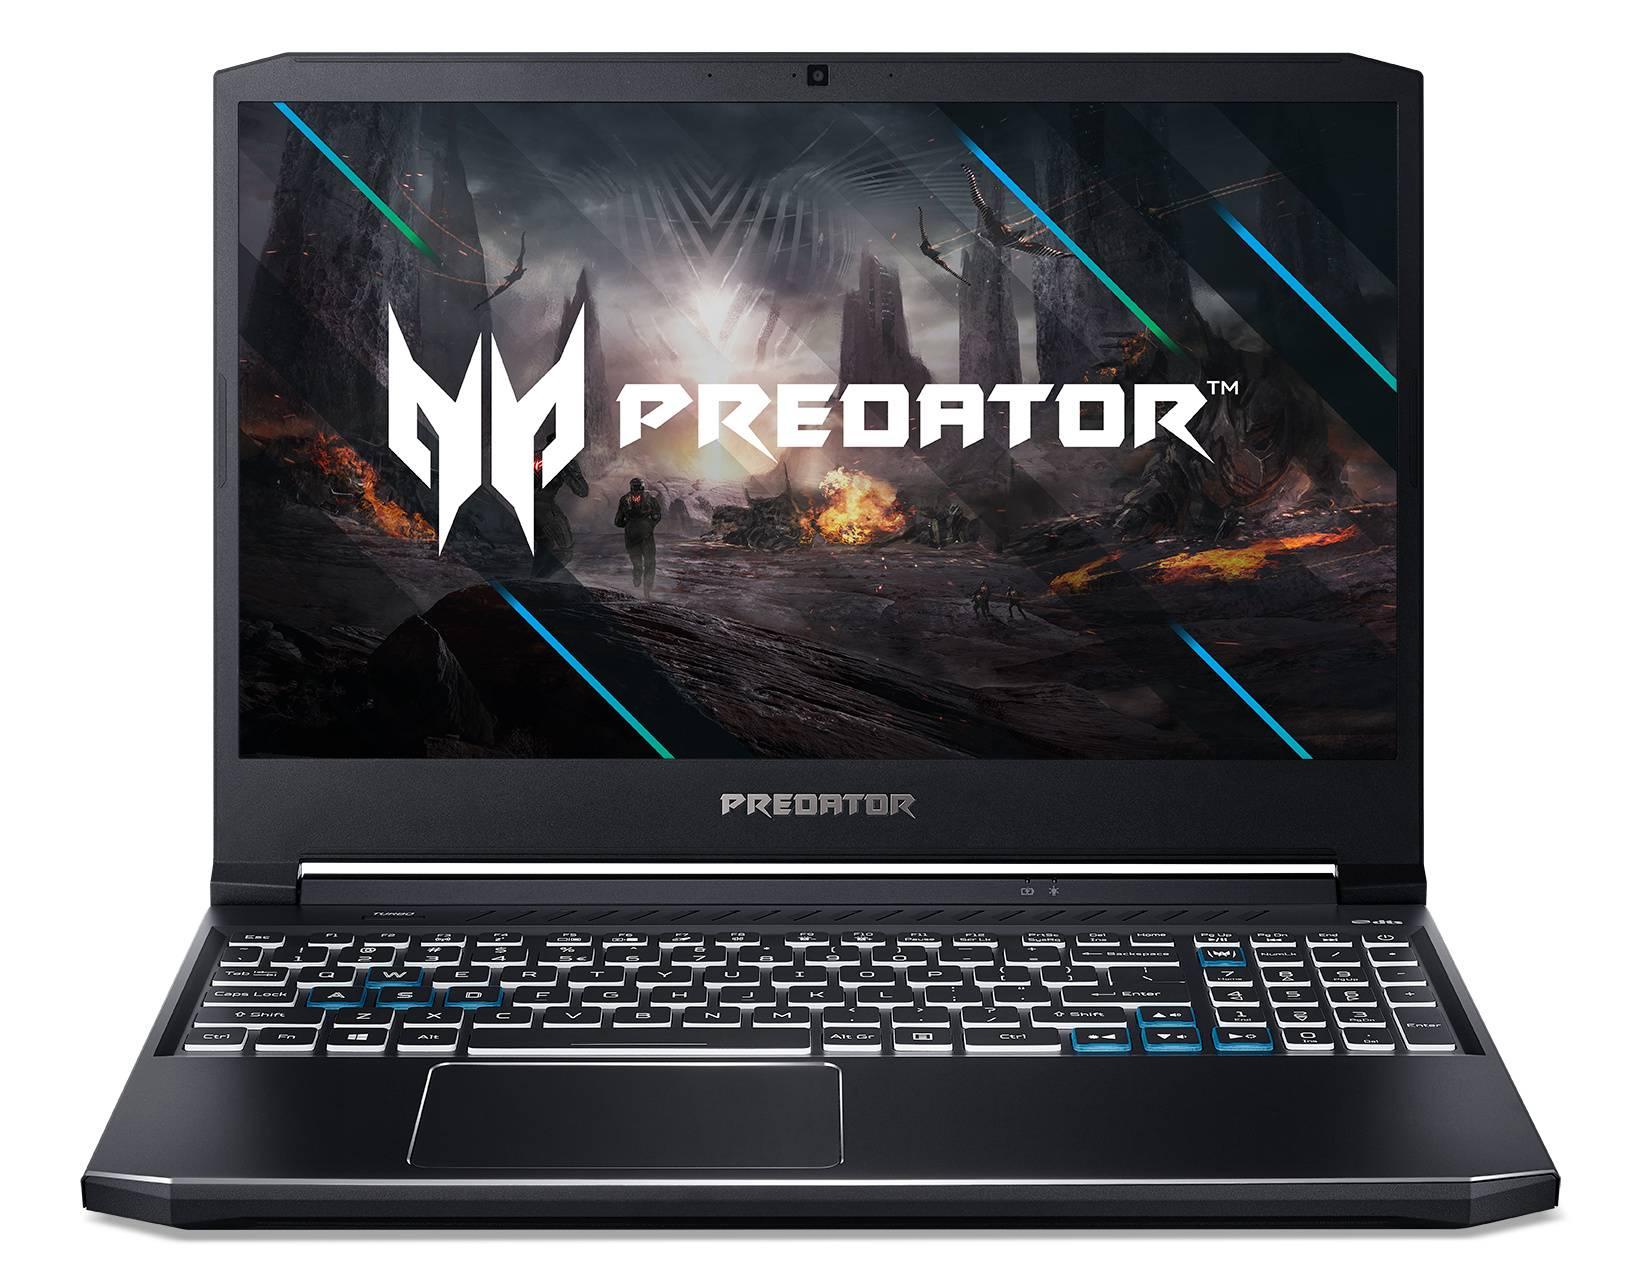 "Ноутбук 15.6"" Acer Predator Helios 300 PH315-53-74DM черный (NH.Q7ZER.00F) - фото 1"